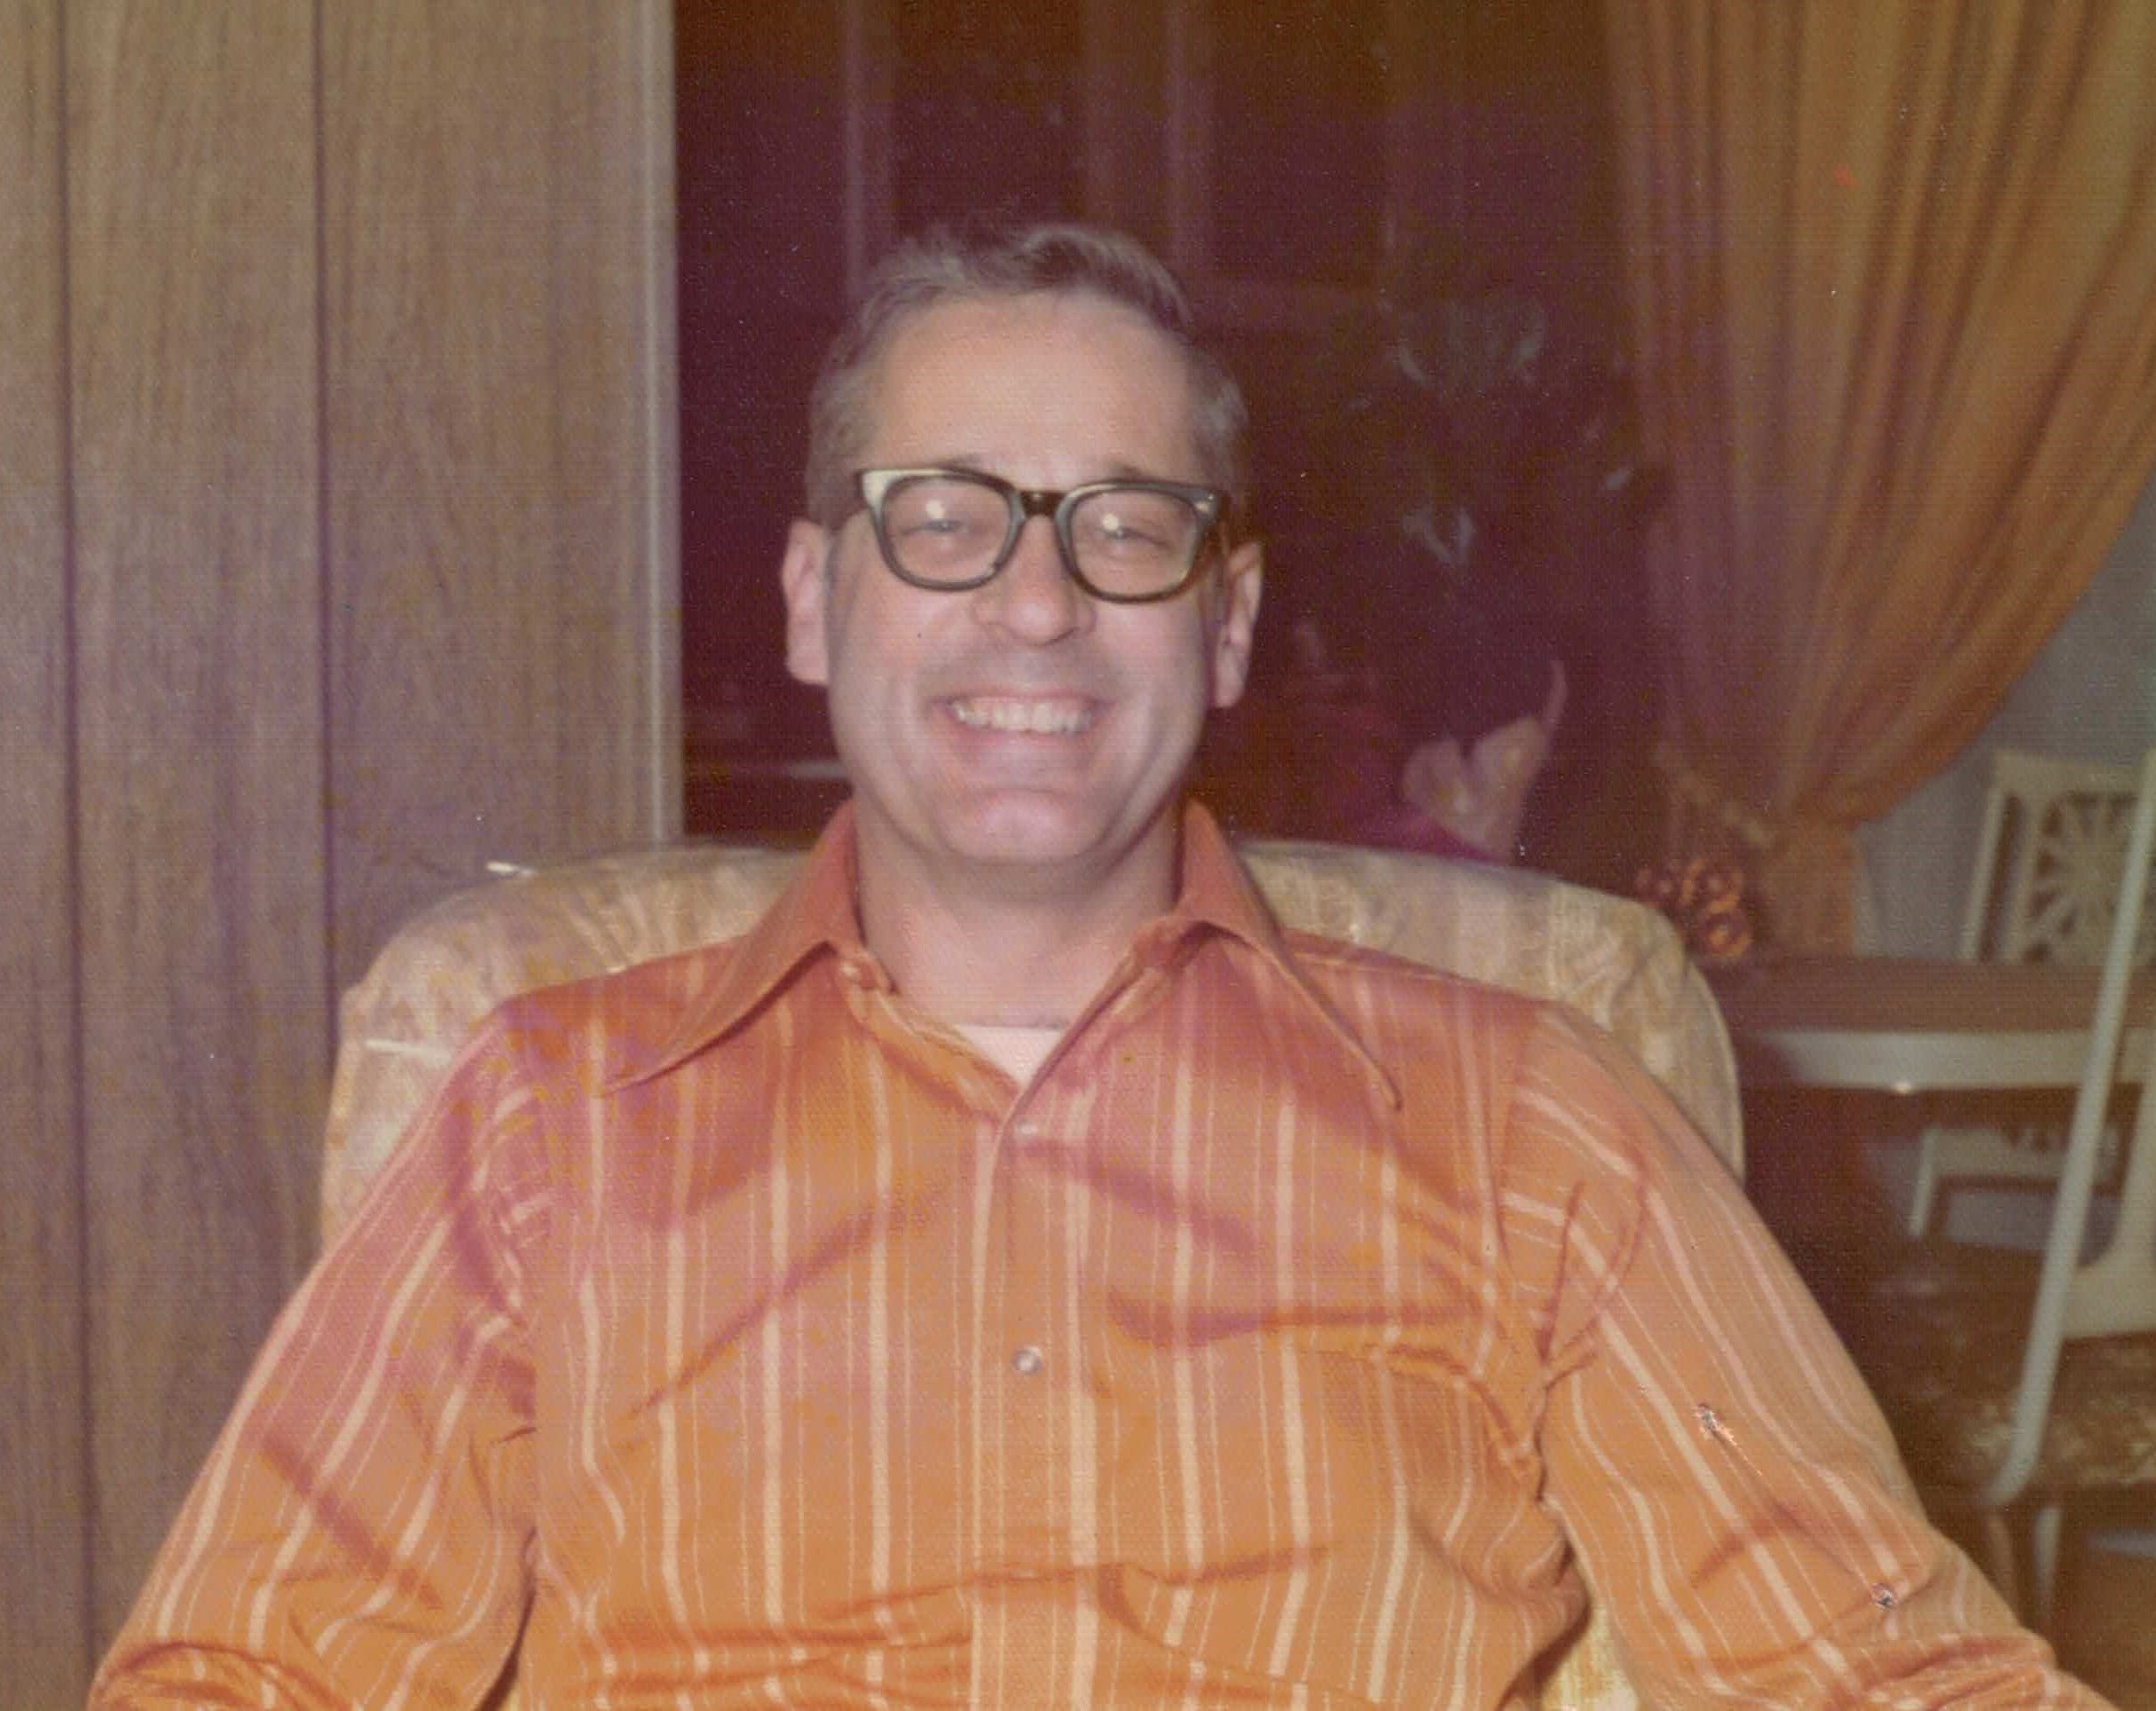 Robert David Sturgiss